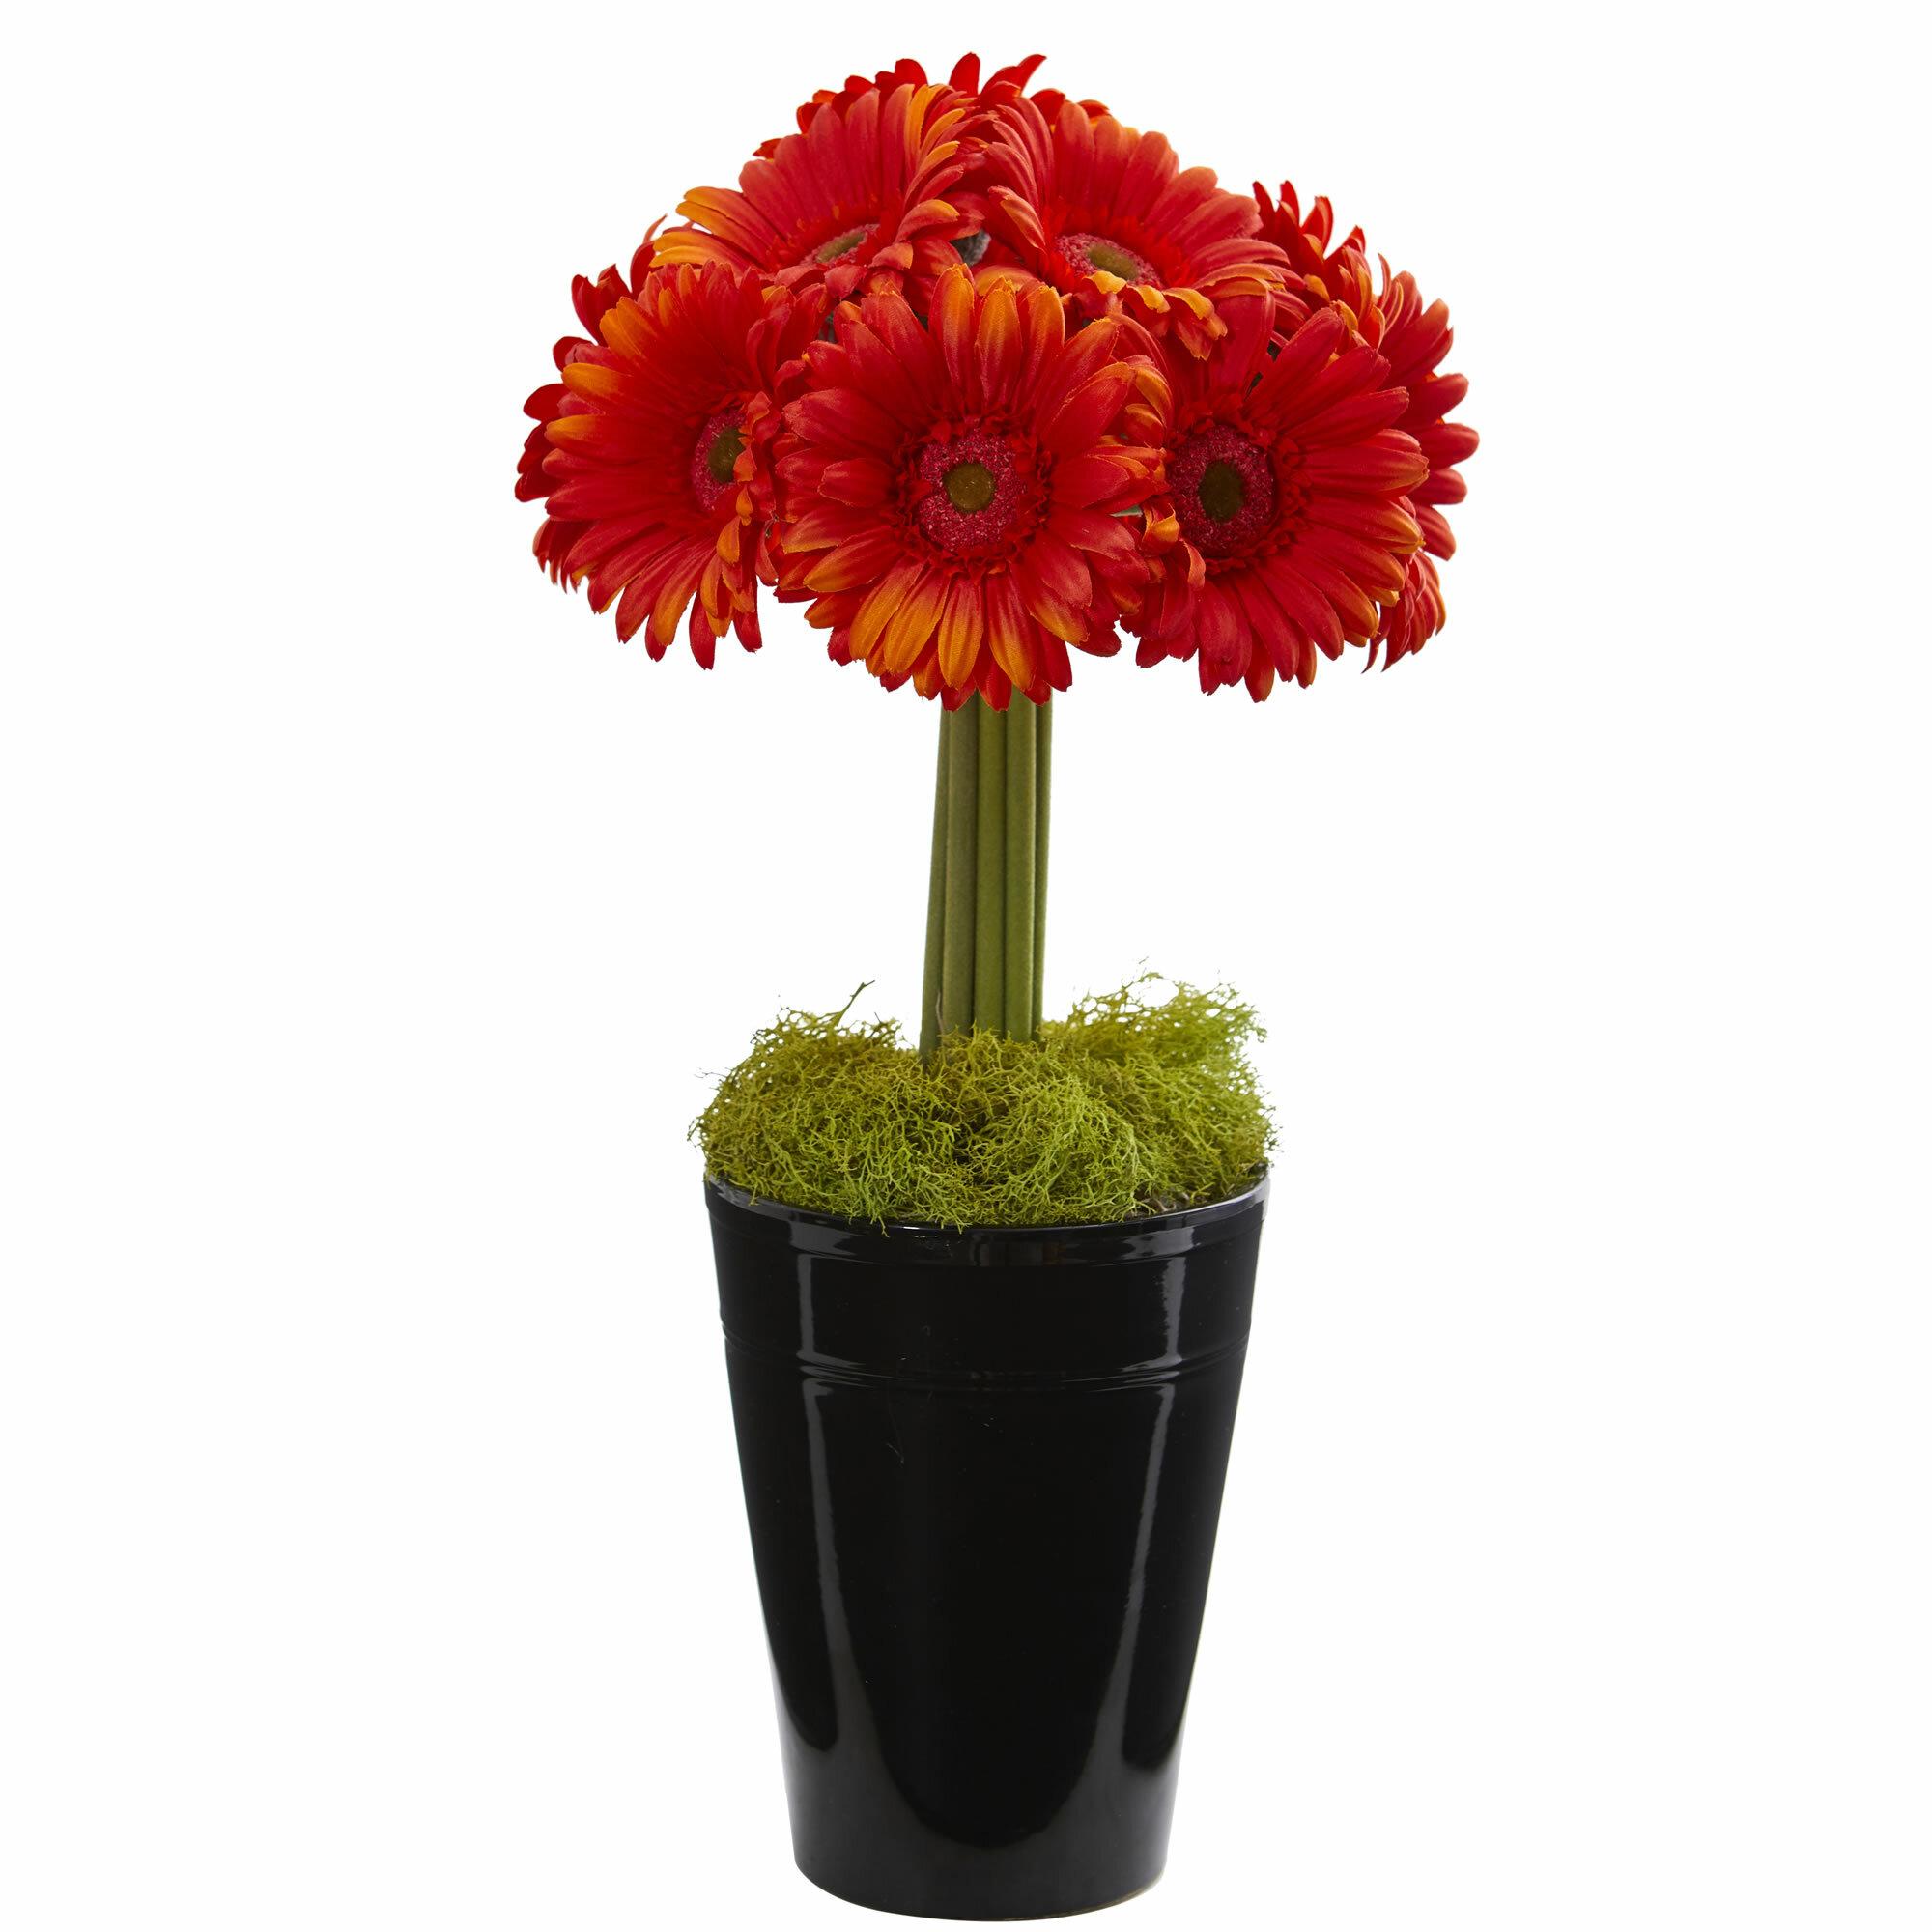 Ebern Designs Gerbera Daisy Artificial Floral Arrangement In Vase &